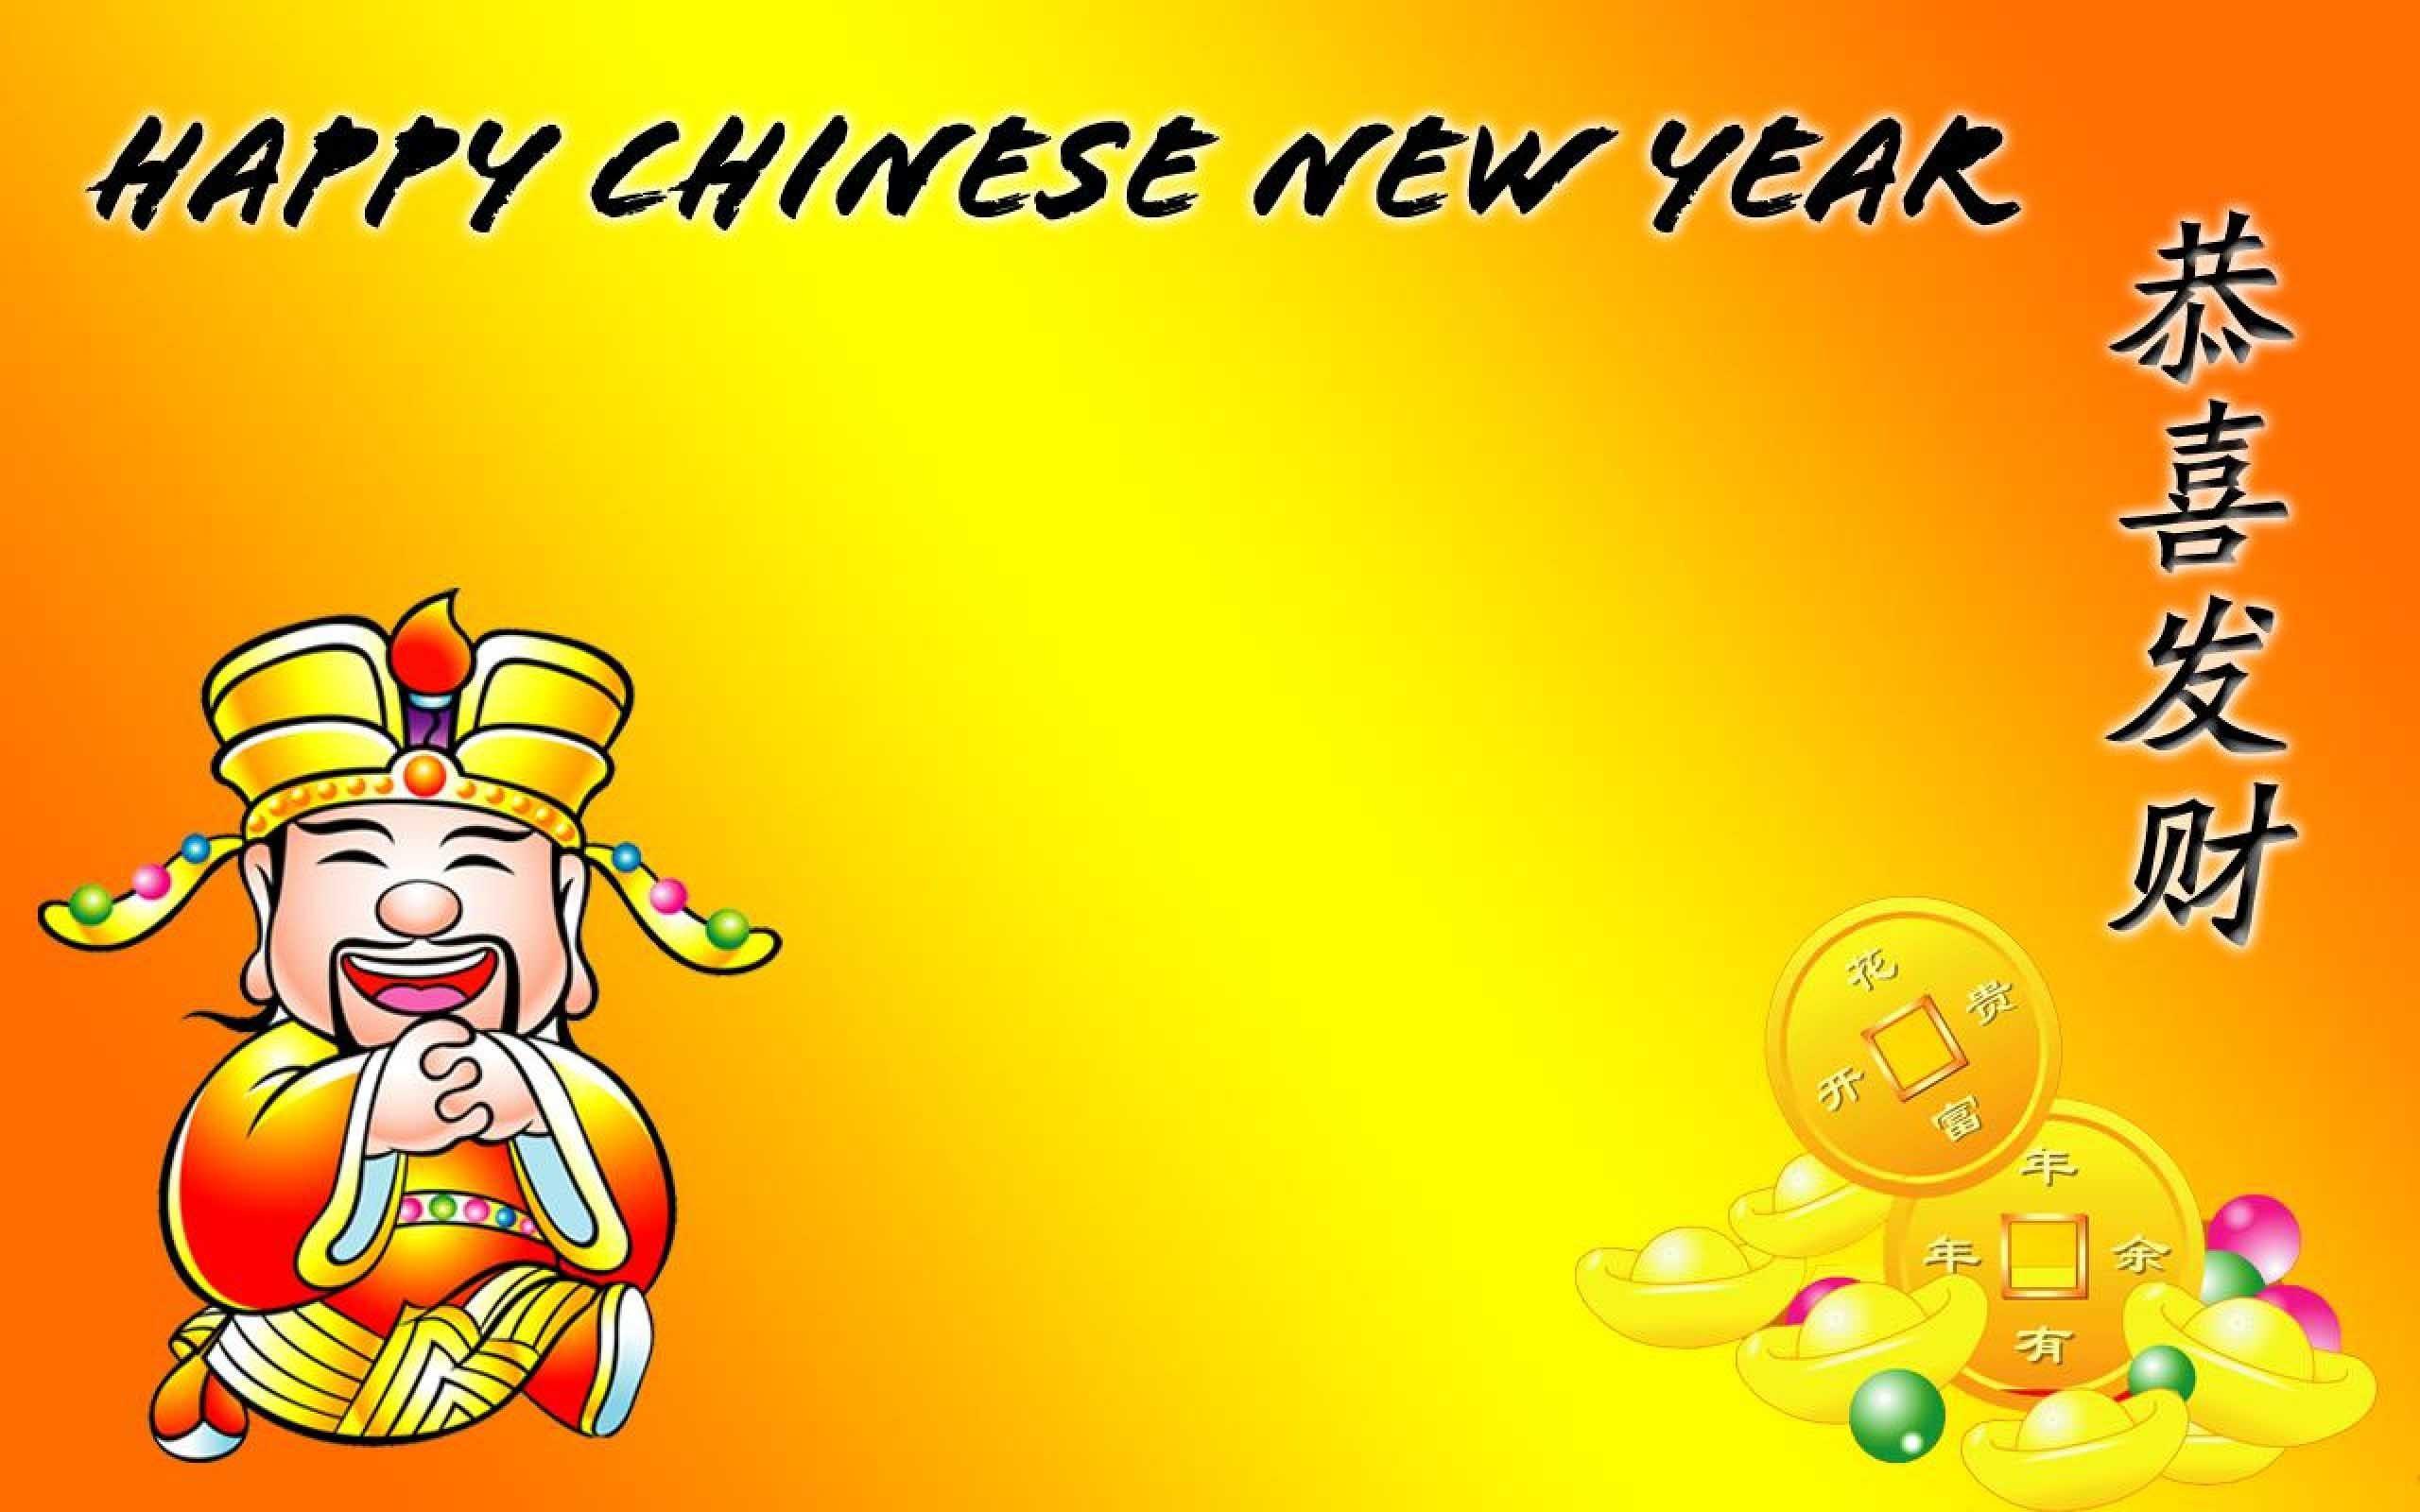 31st january 2014 chinese new year 2014 chinese new year wishes